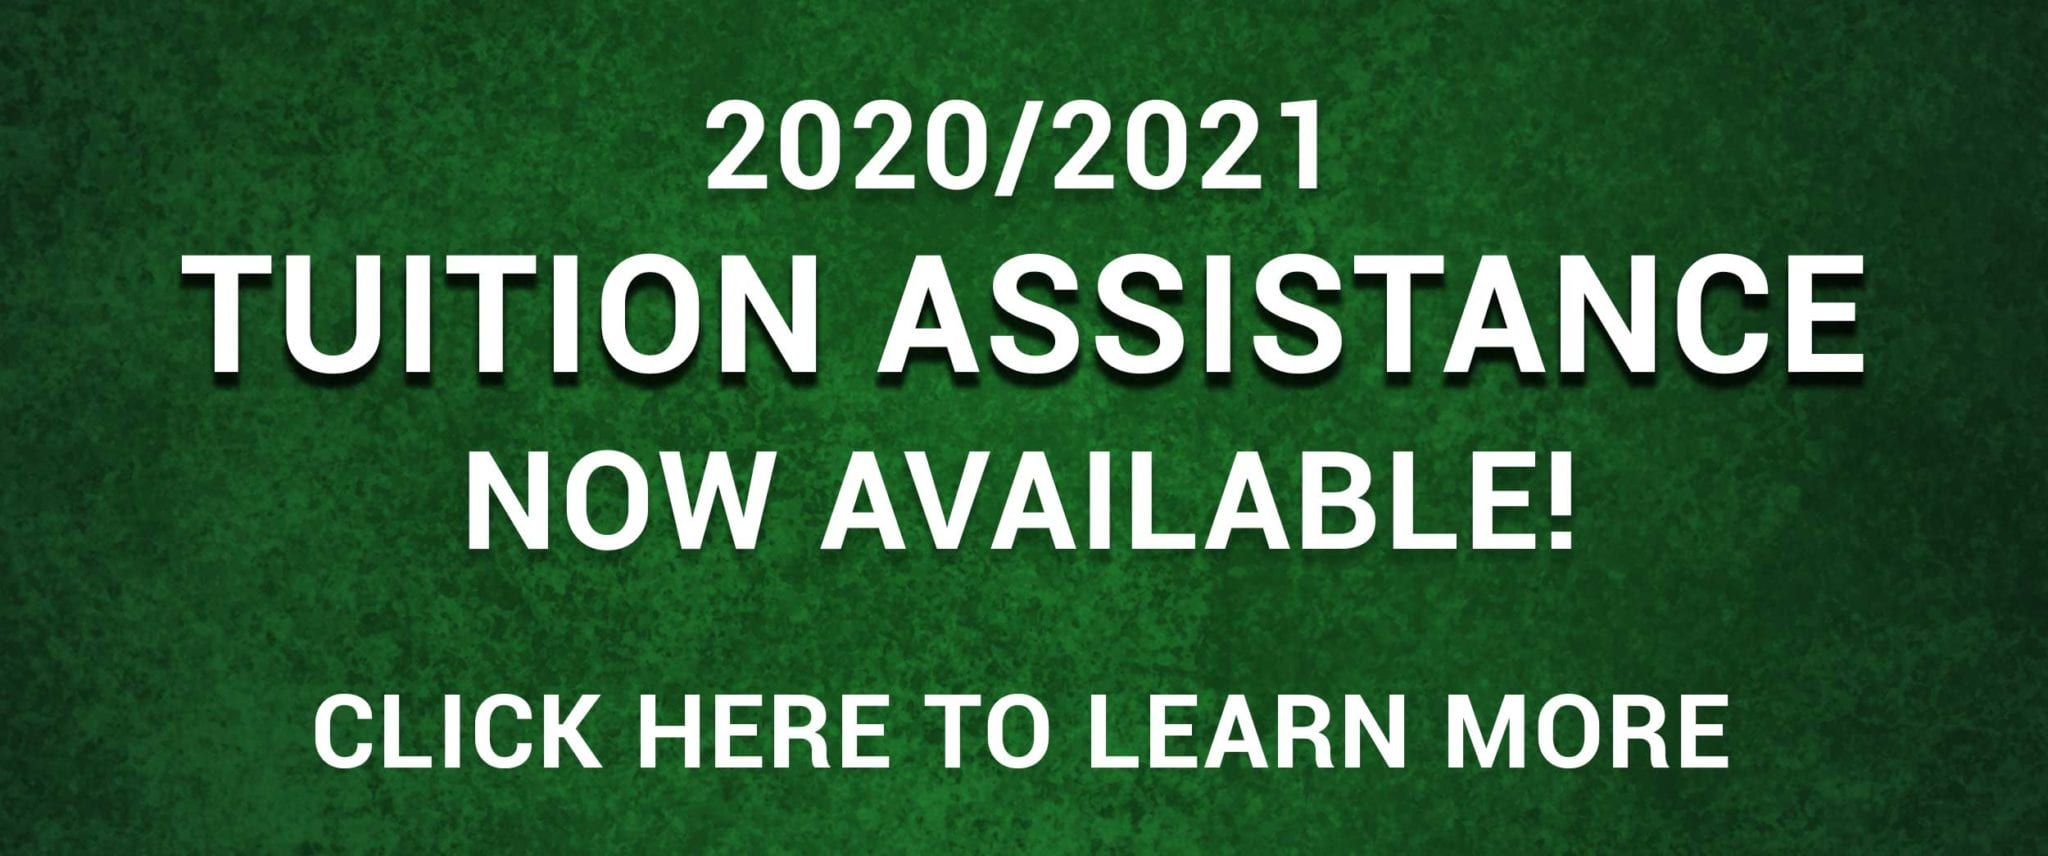 tuitionassistance20